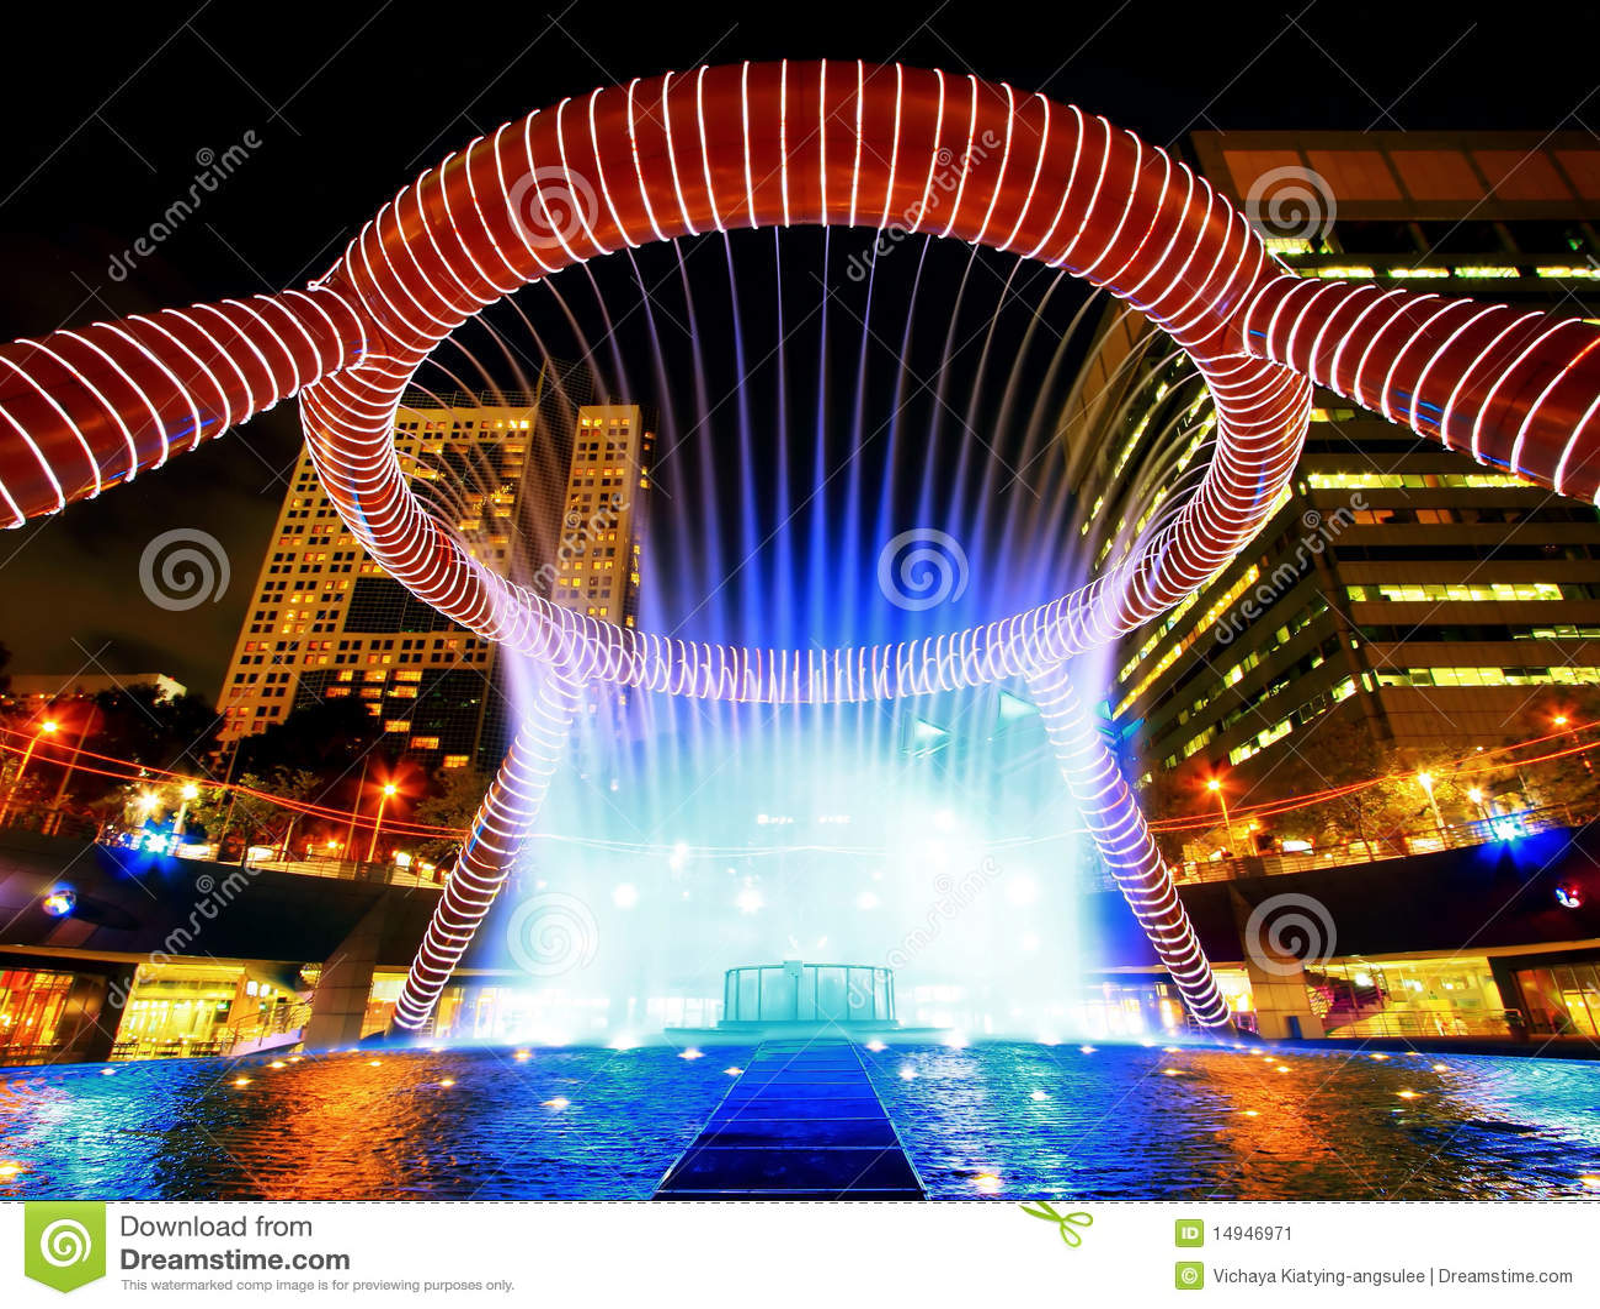 wealth Fountain Singapore